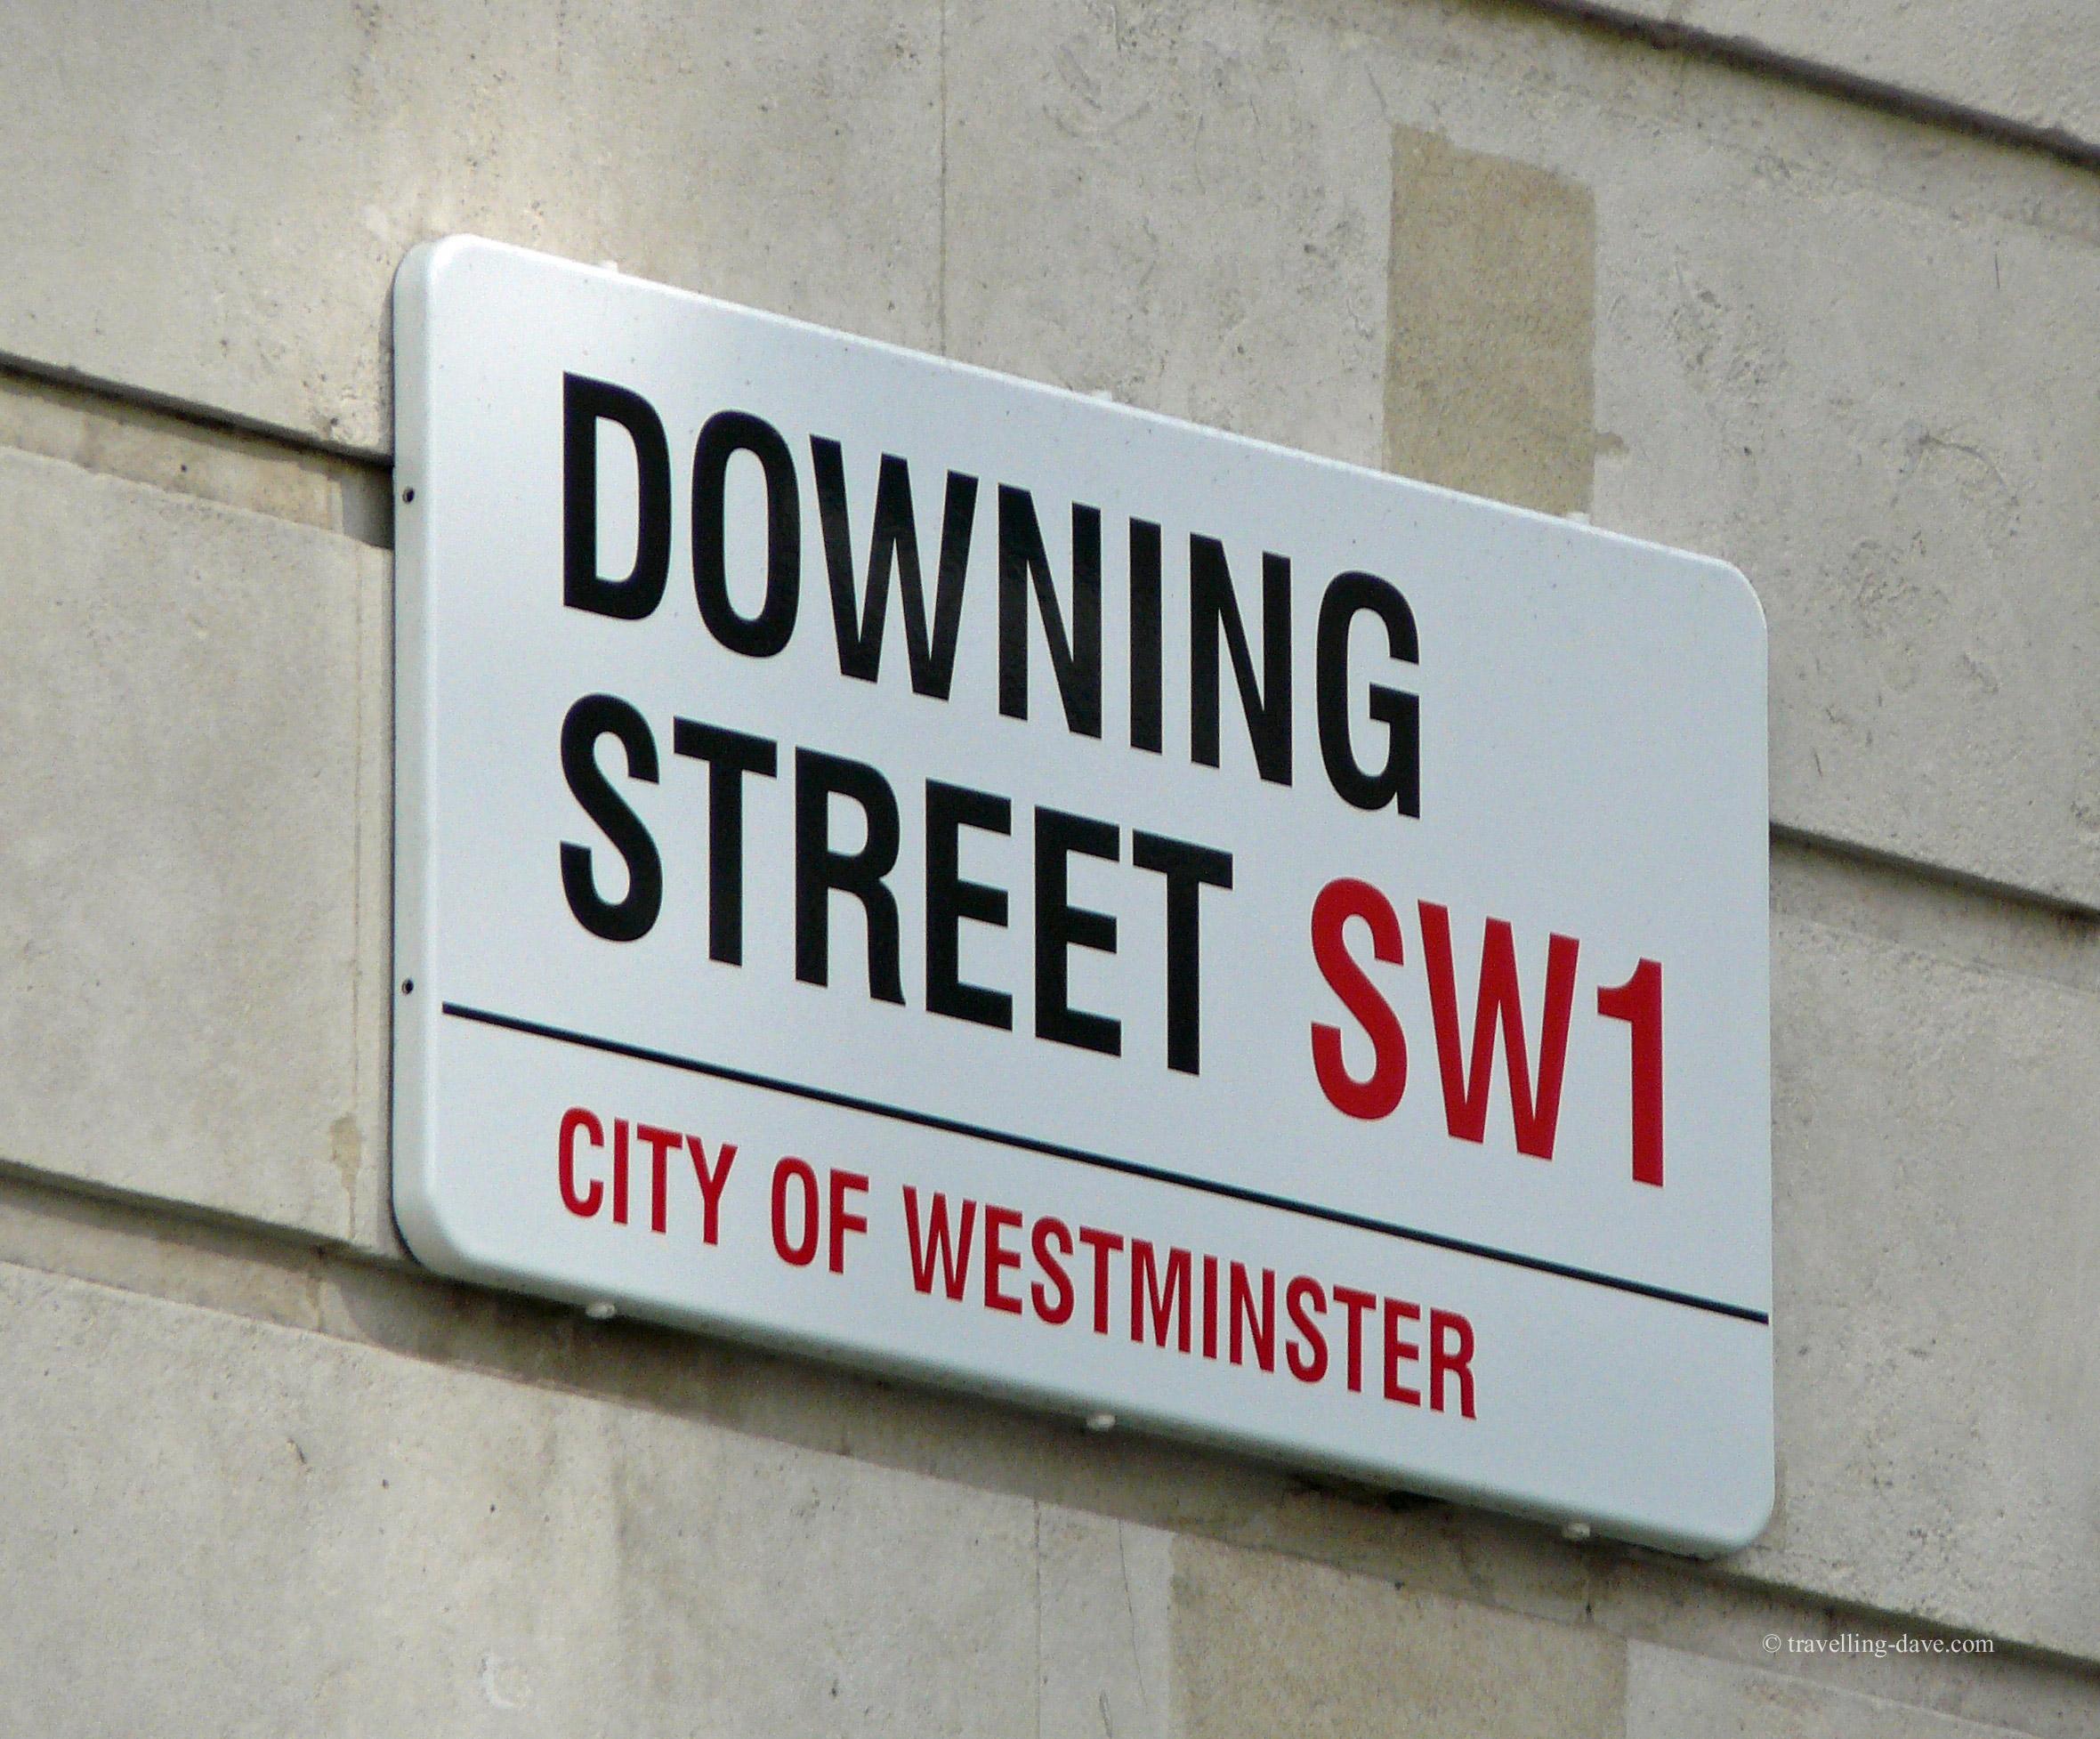 Looking up at Downing Street sign